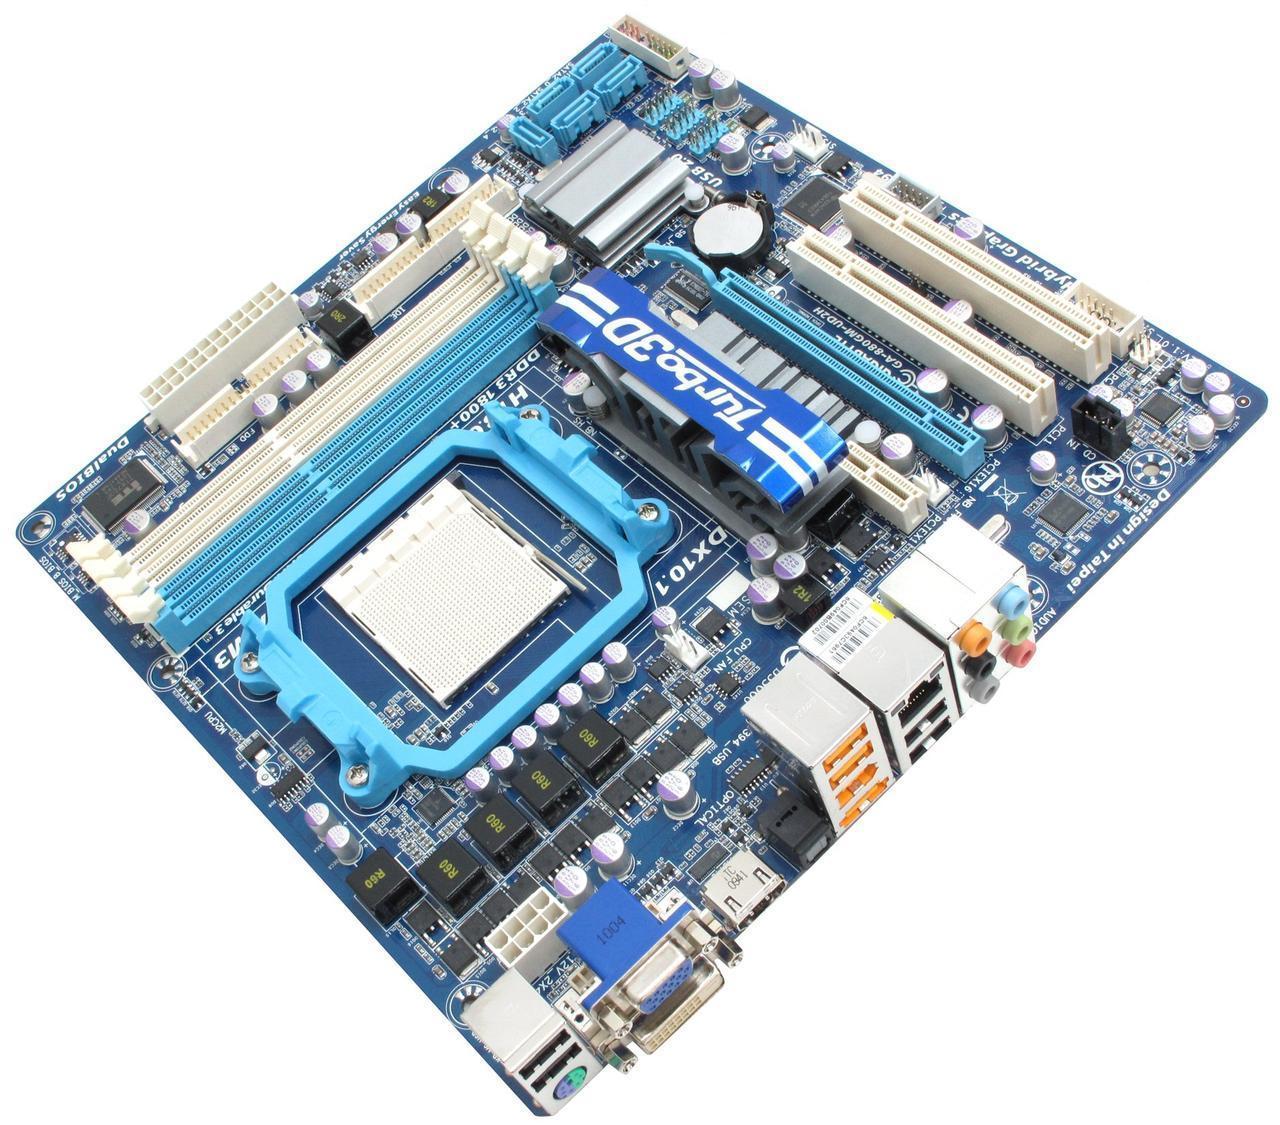 Материнская плата, Gigabyte GA-880GM-UD2H, процессор AMD Phenom II, сокет AM3